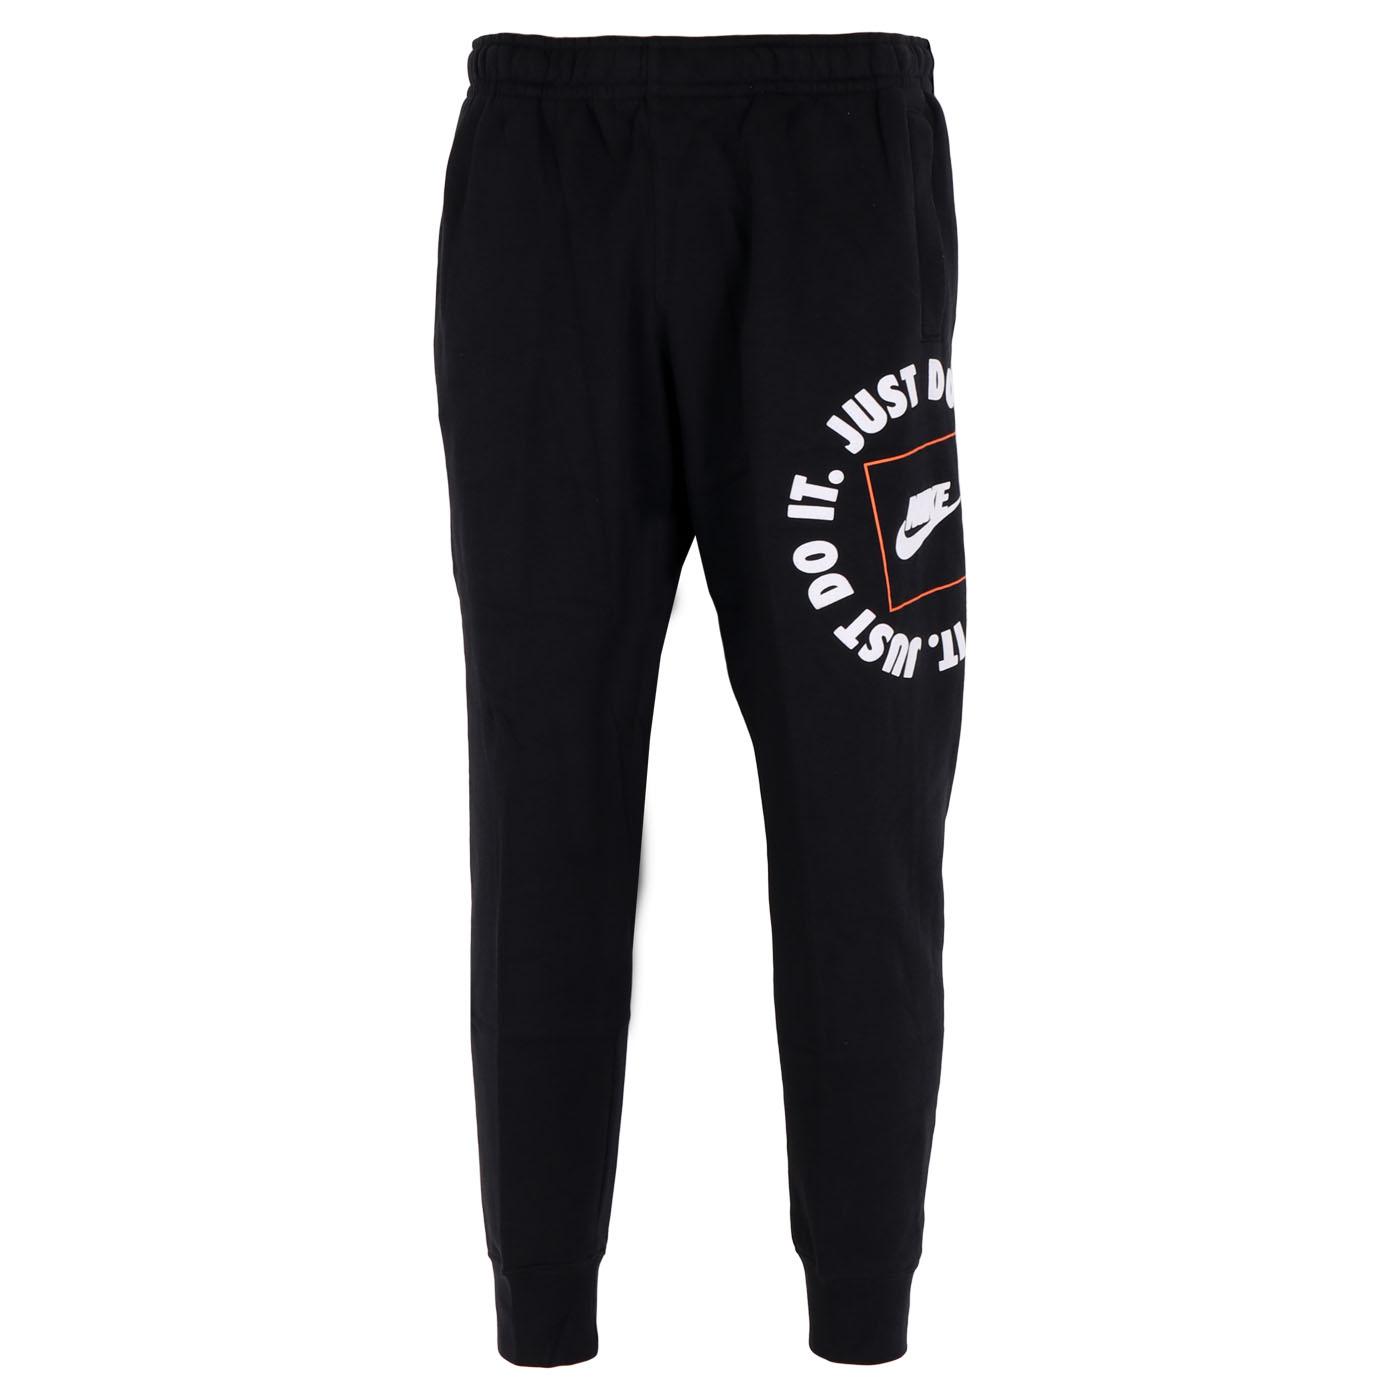 Produktbild von Nike Sportswear JDI Fleece Hose - black/black DA0144-010